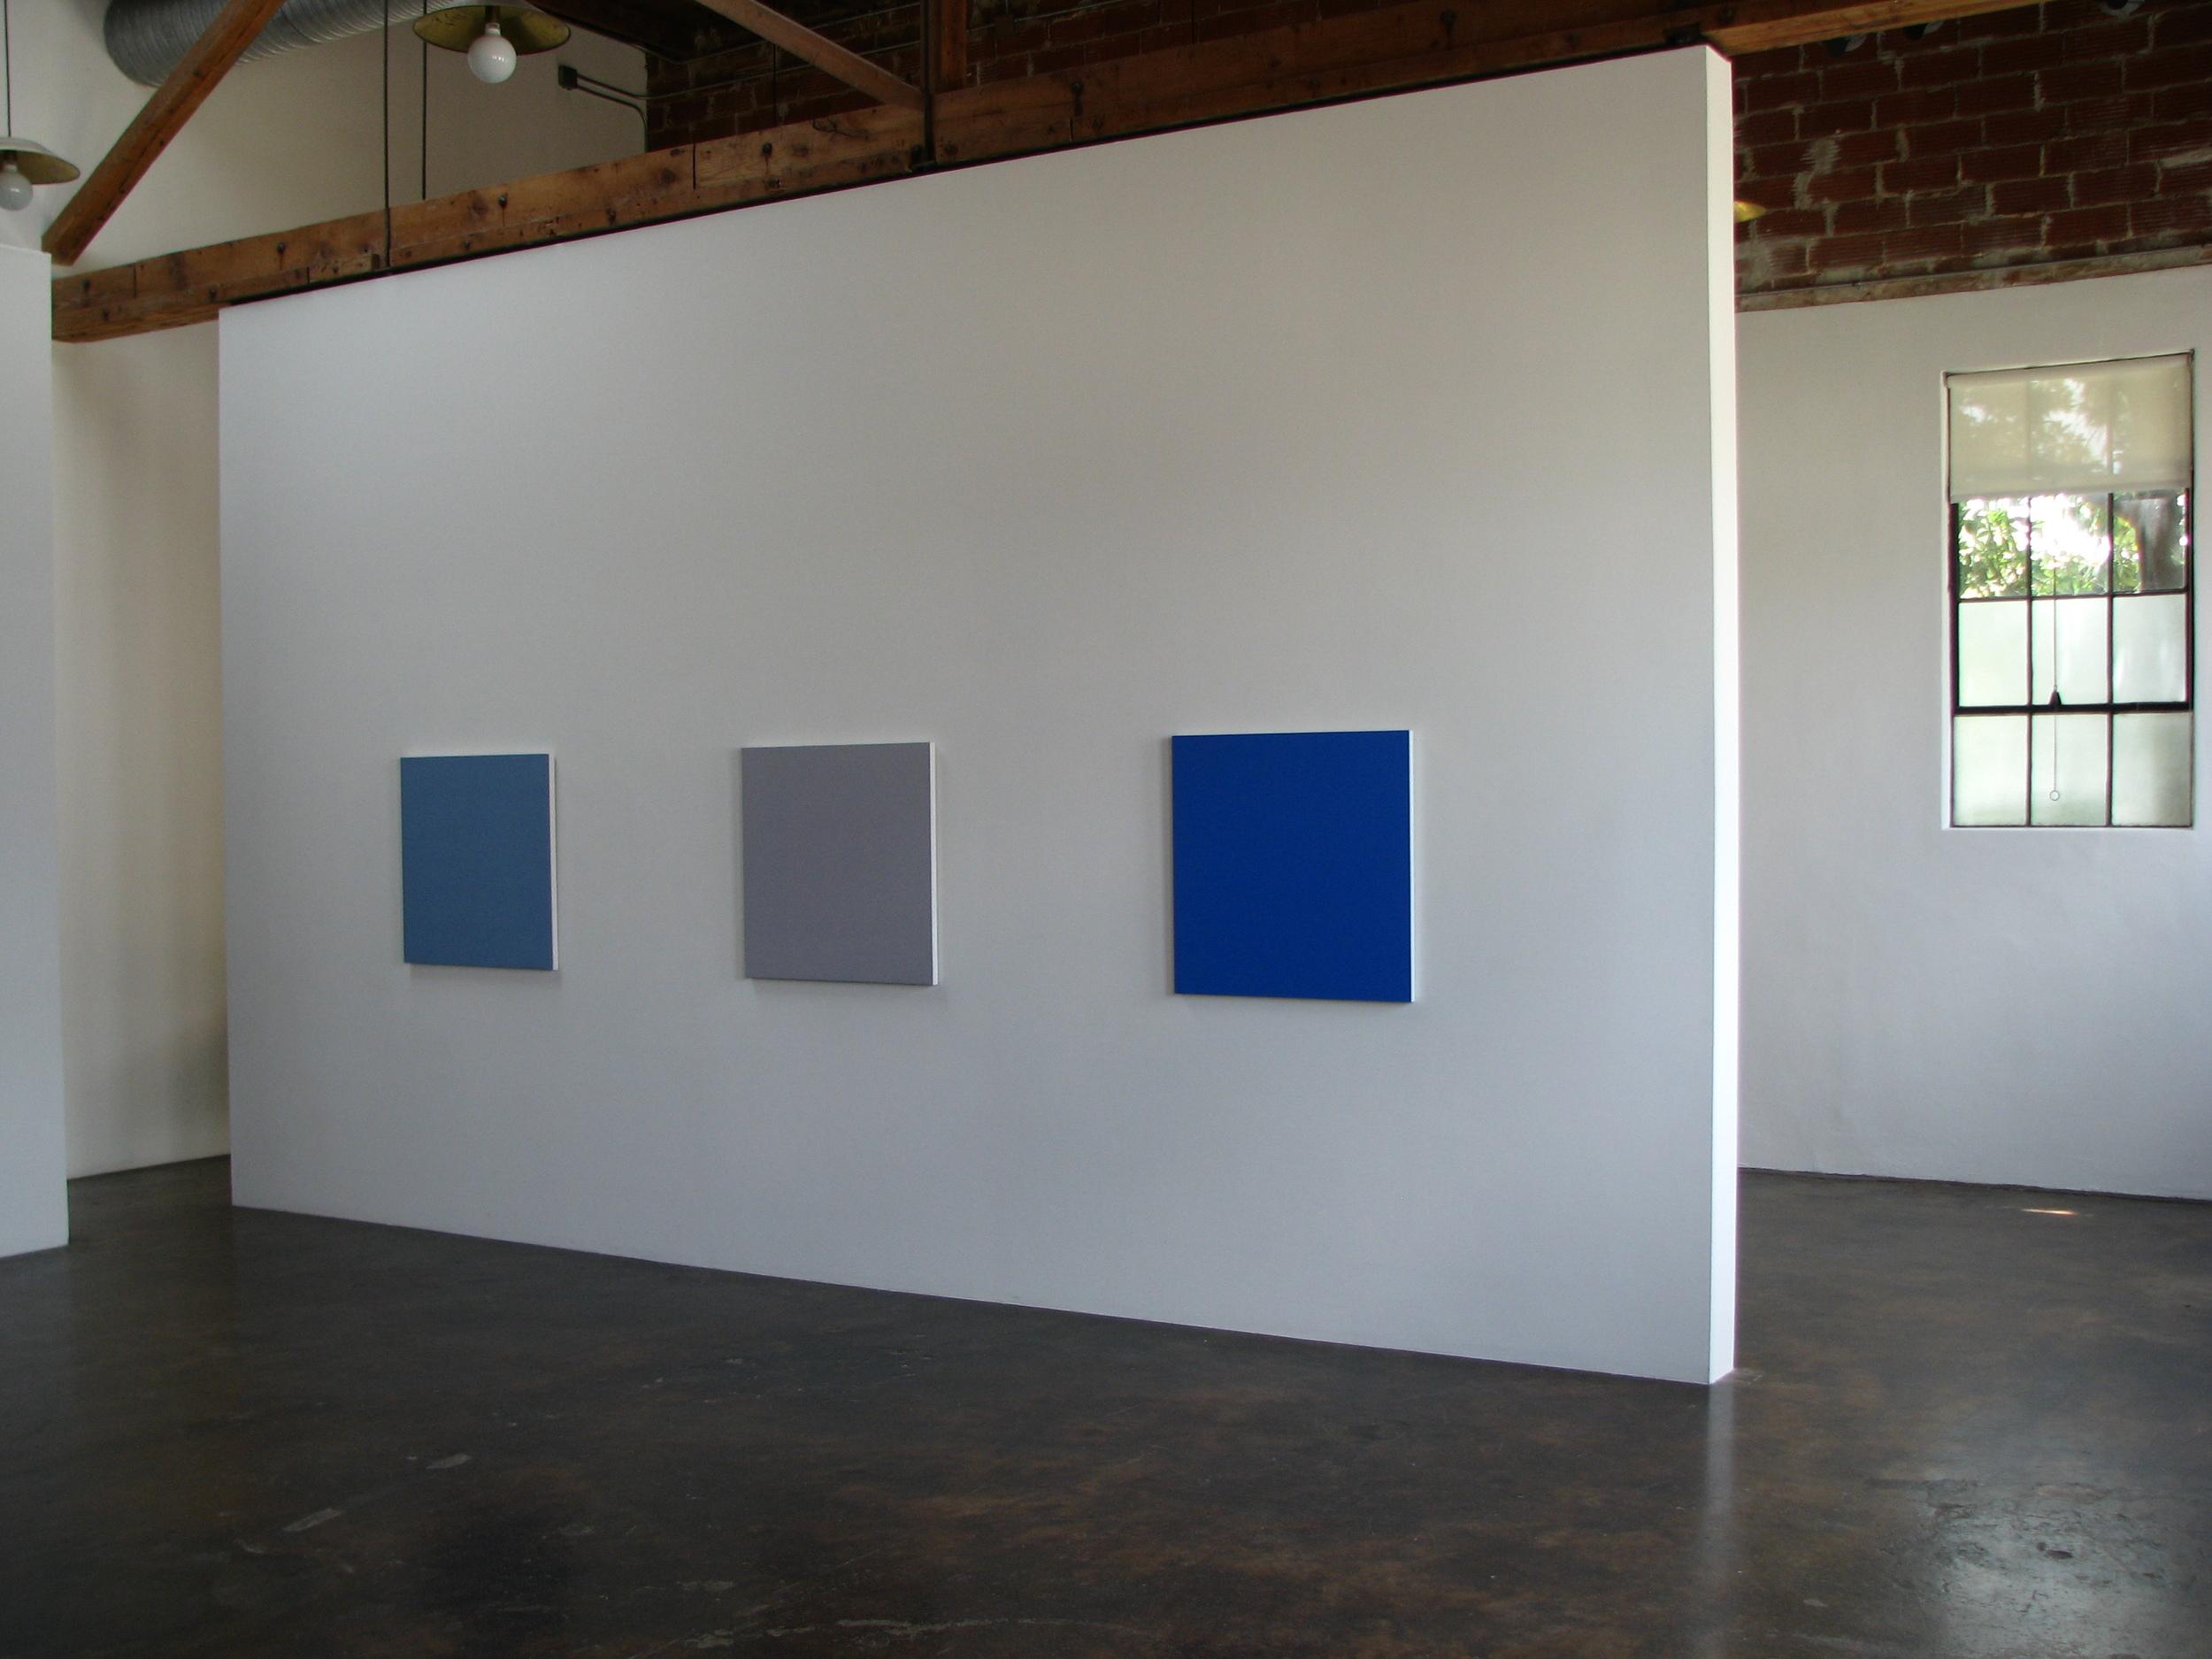 rudolf-de-crignis-at-Lawrence-Markey-2009-installation-view